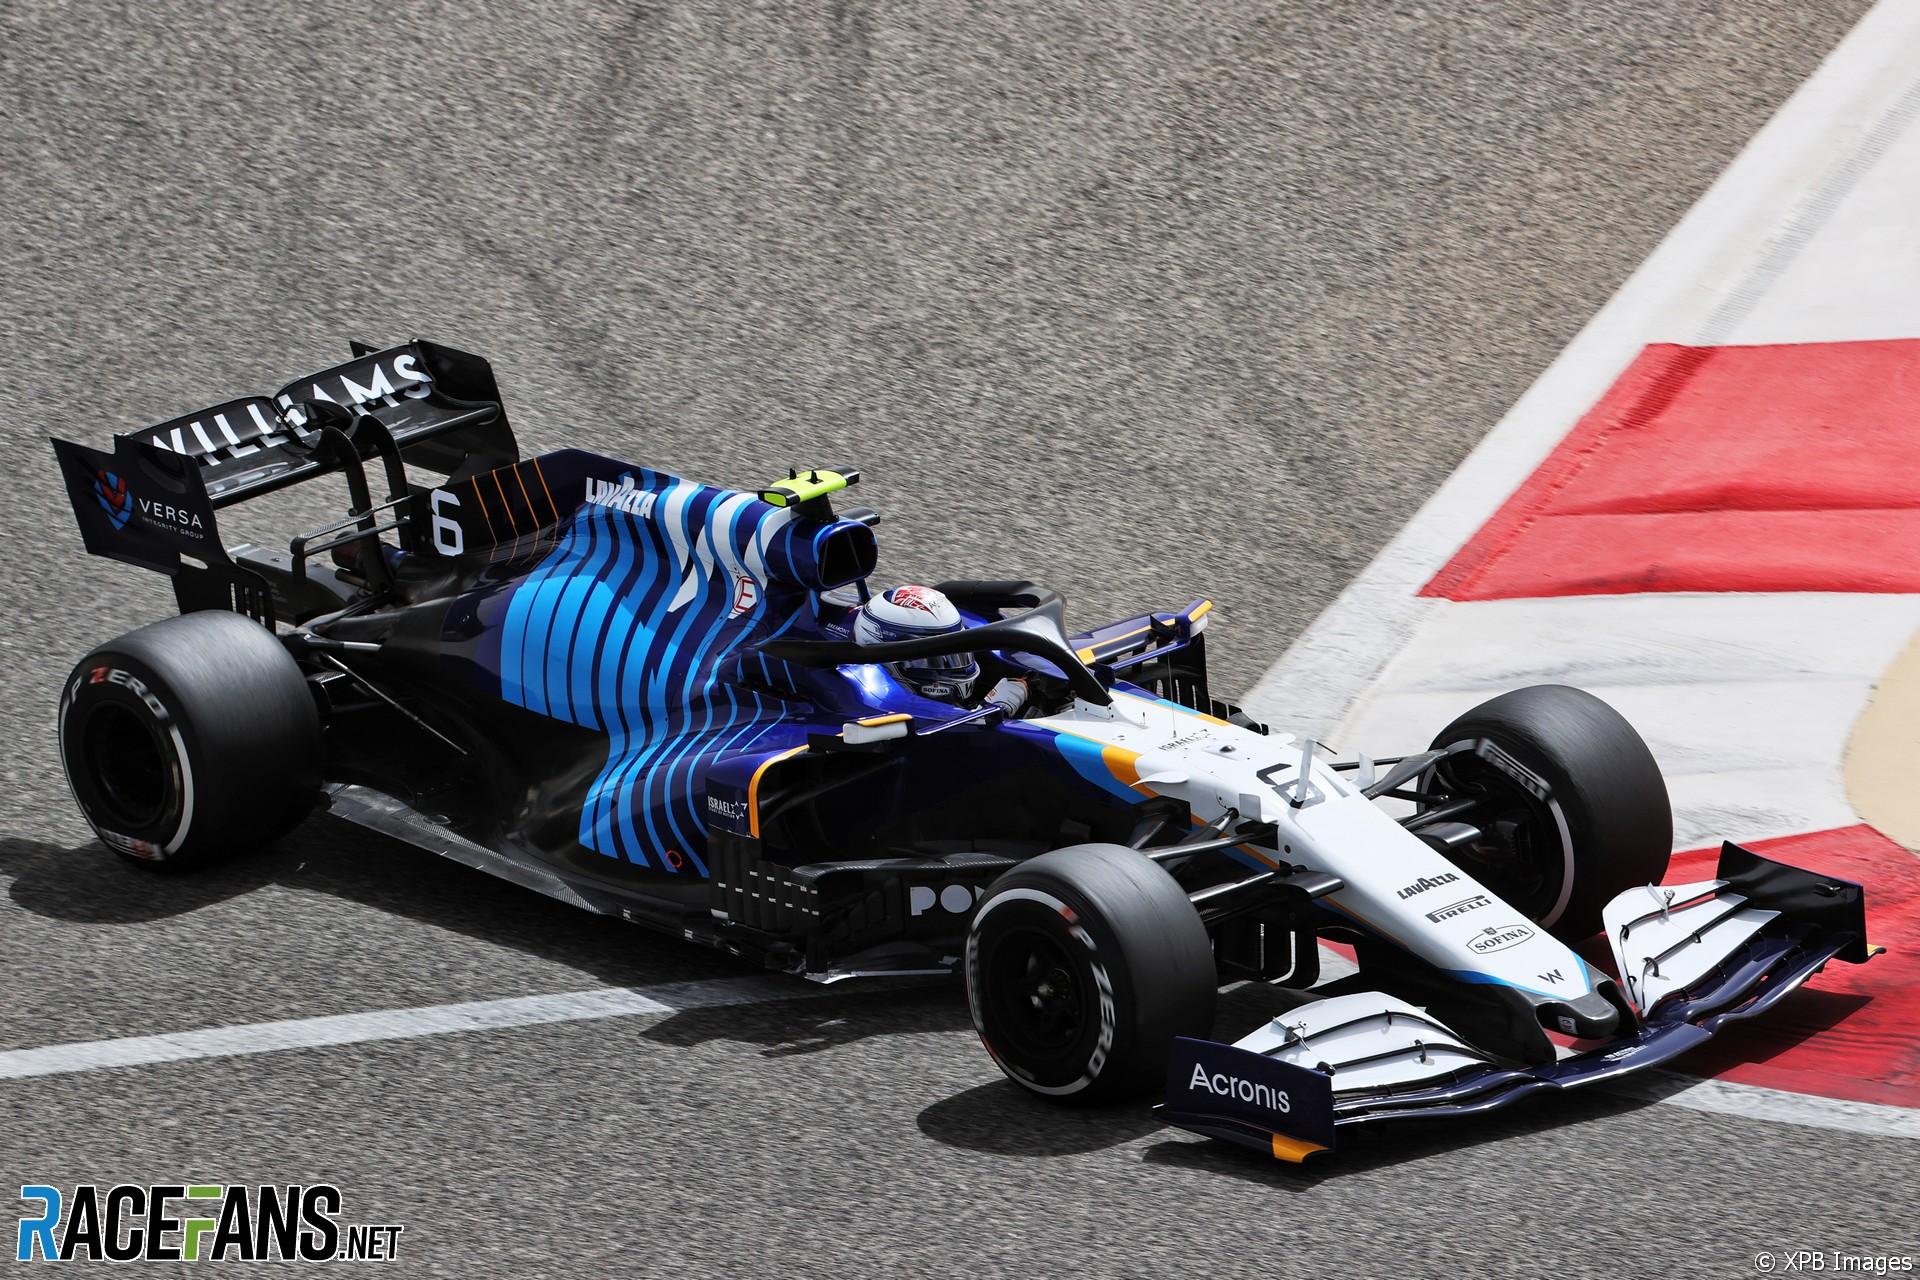 Nicholas Latifi, Williams, Circuito Internacional de Baréin, 2021